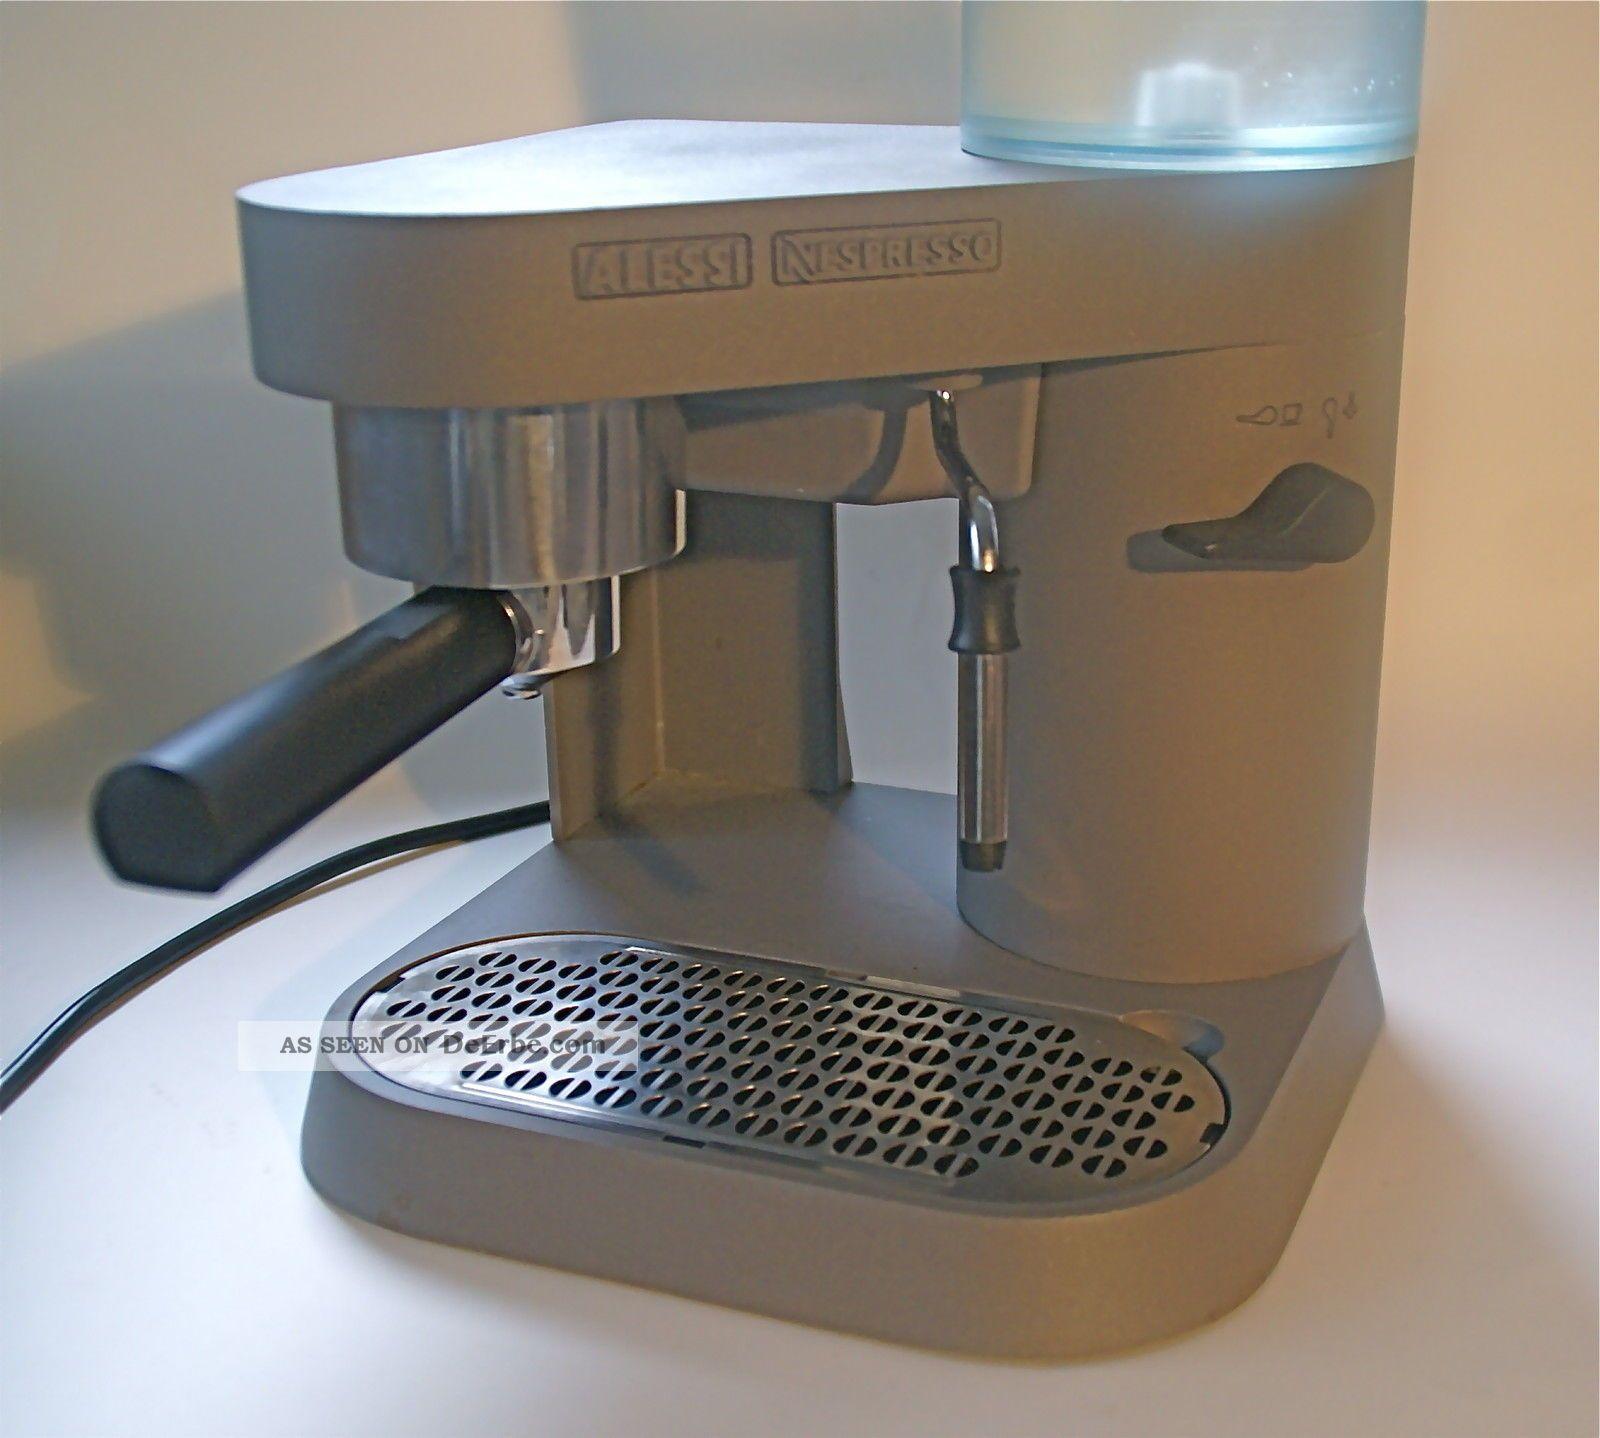 alessi nespresso espressomaschine type coban rs05 anthrazit. Black Bedroom Furniture Sets. Home Design Ideas